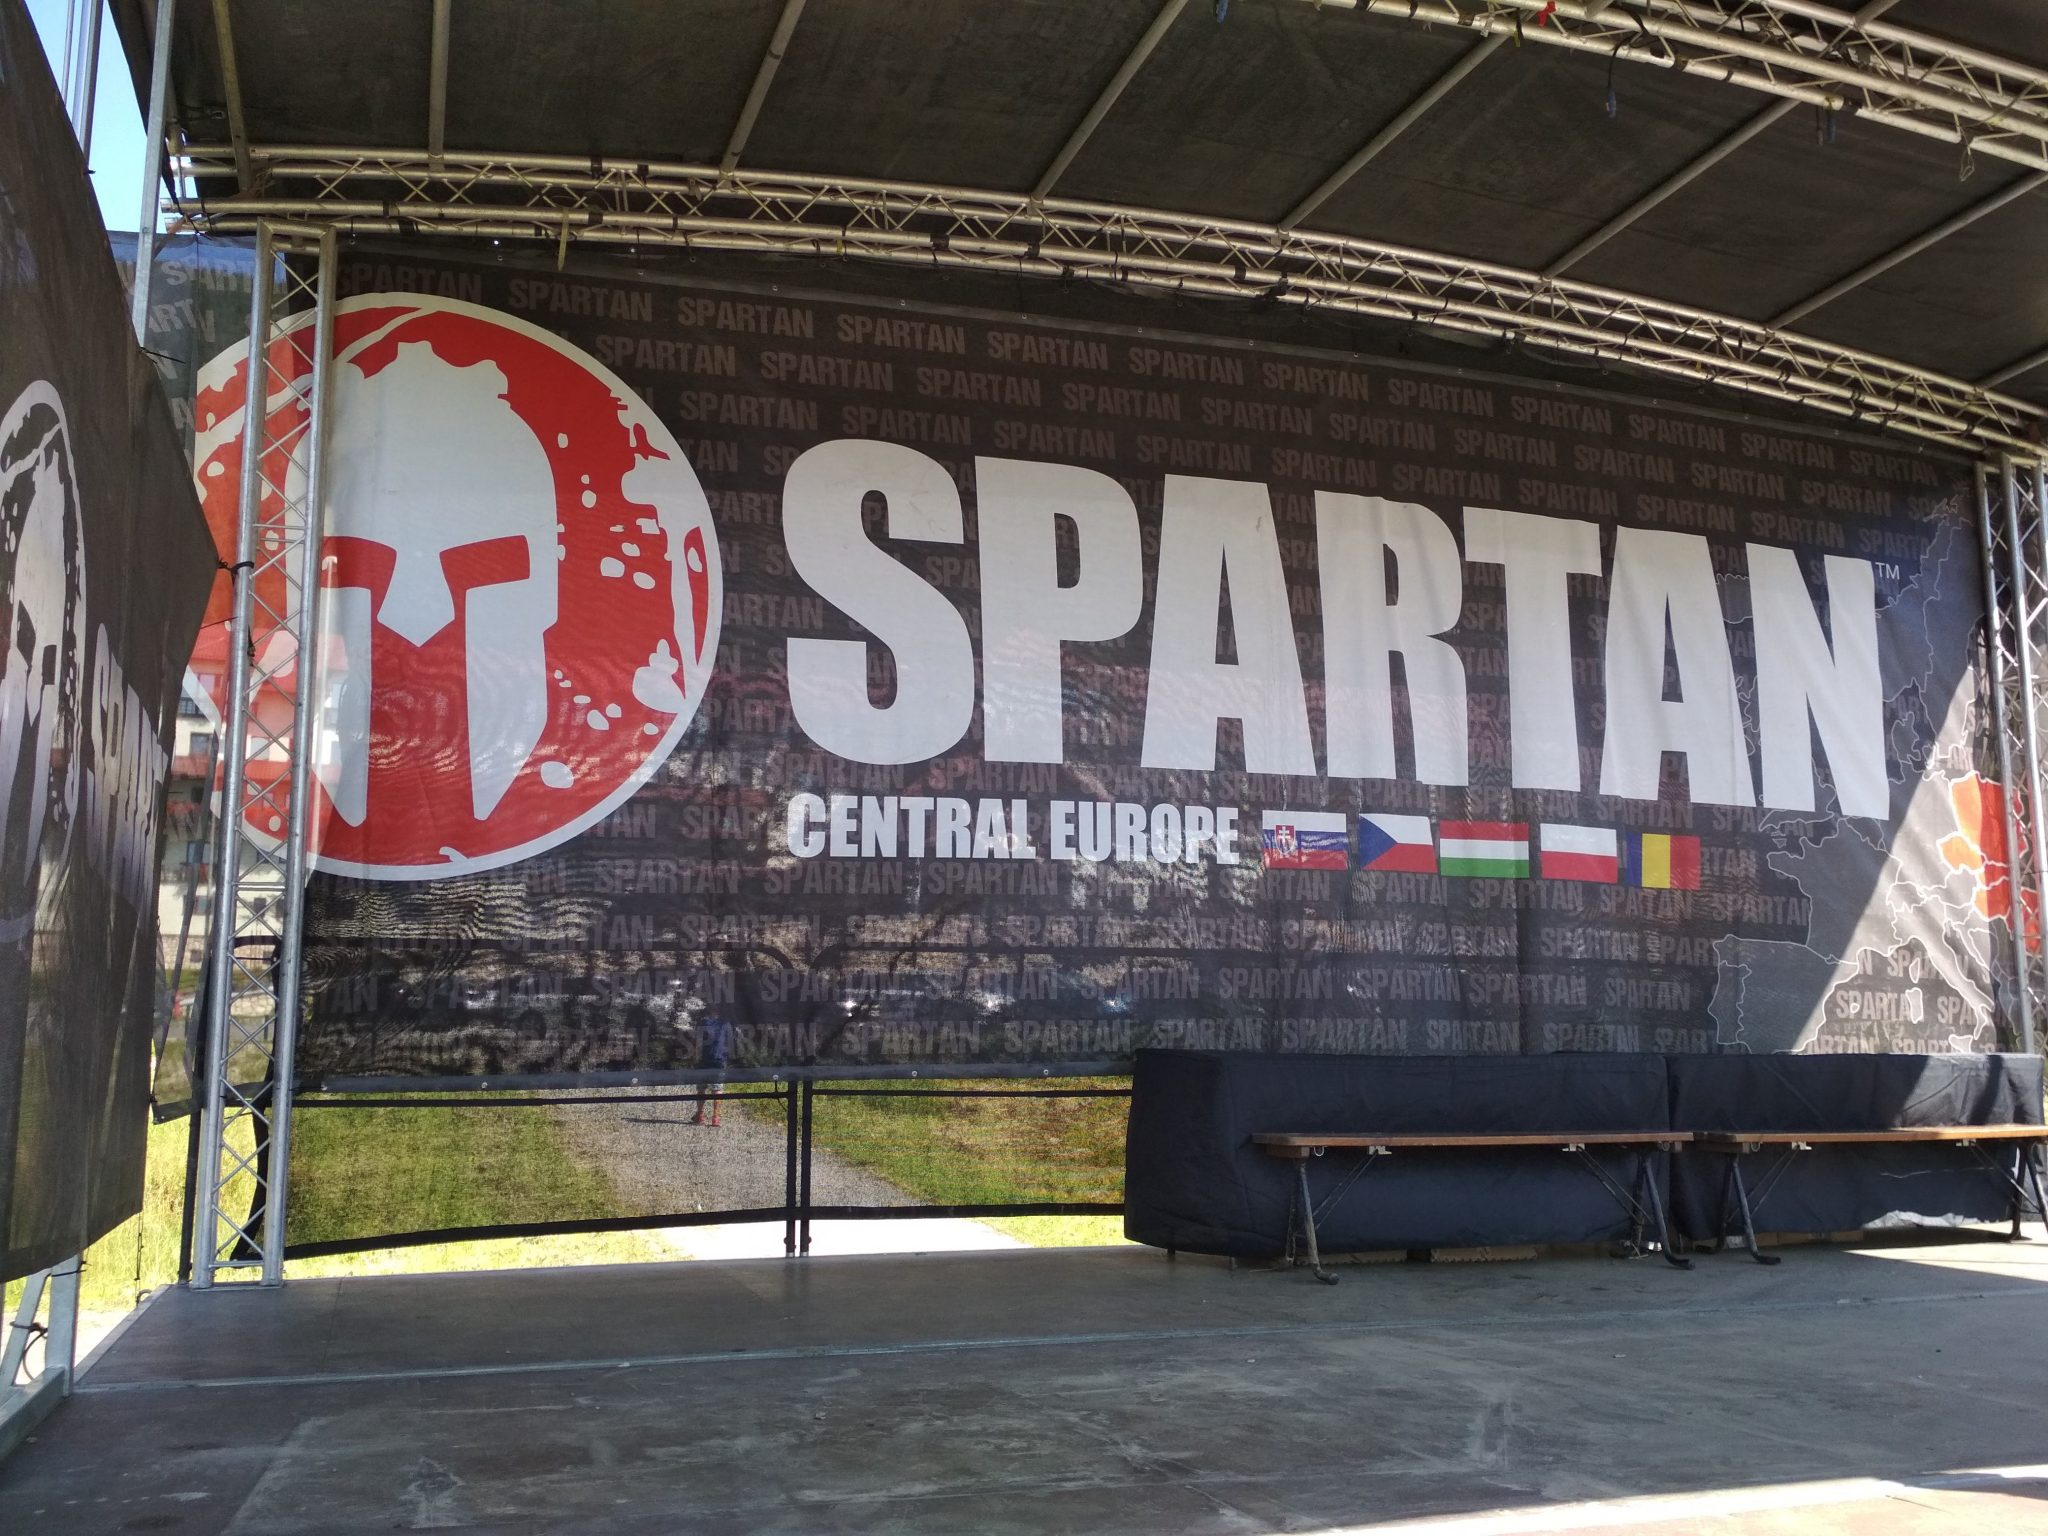 central-europe-spartan